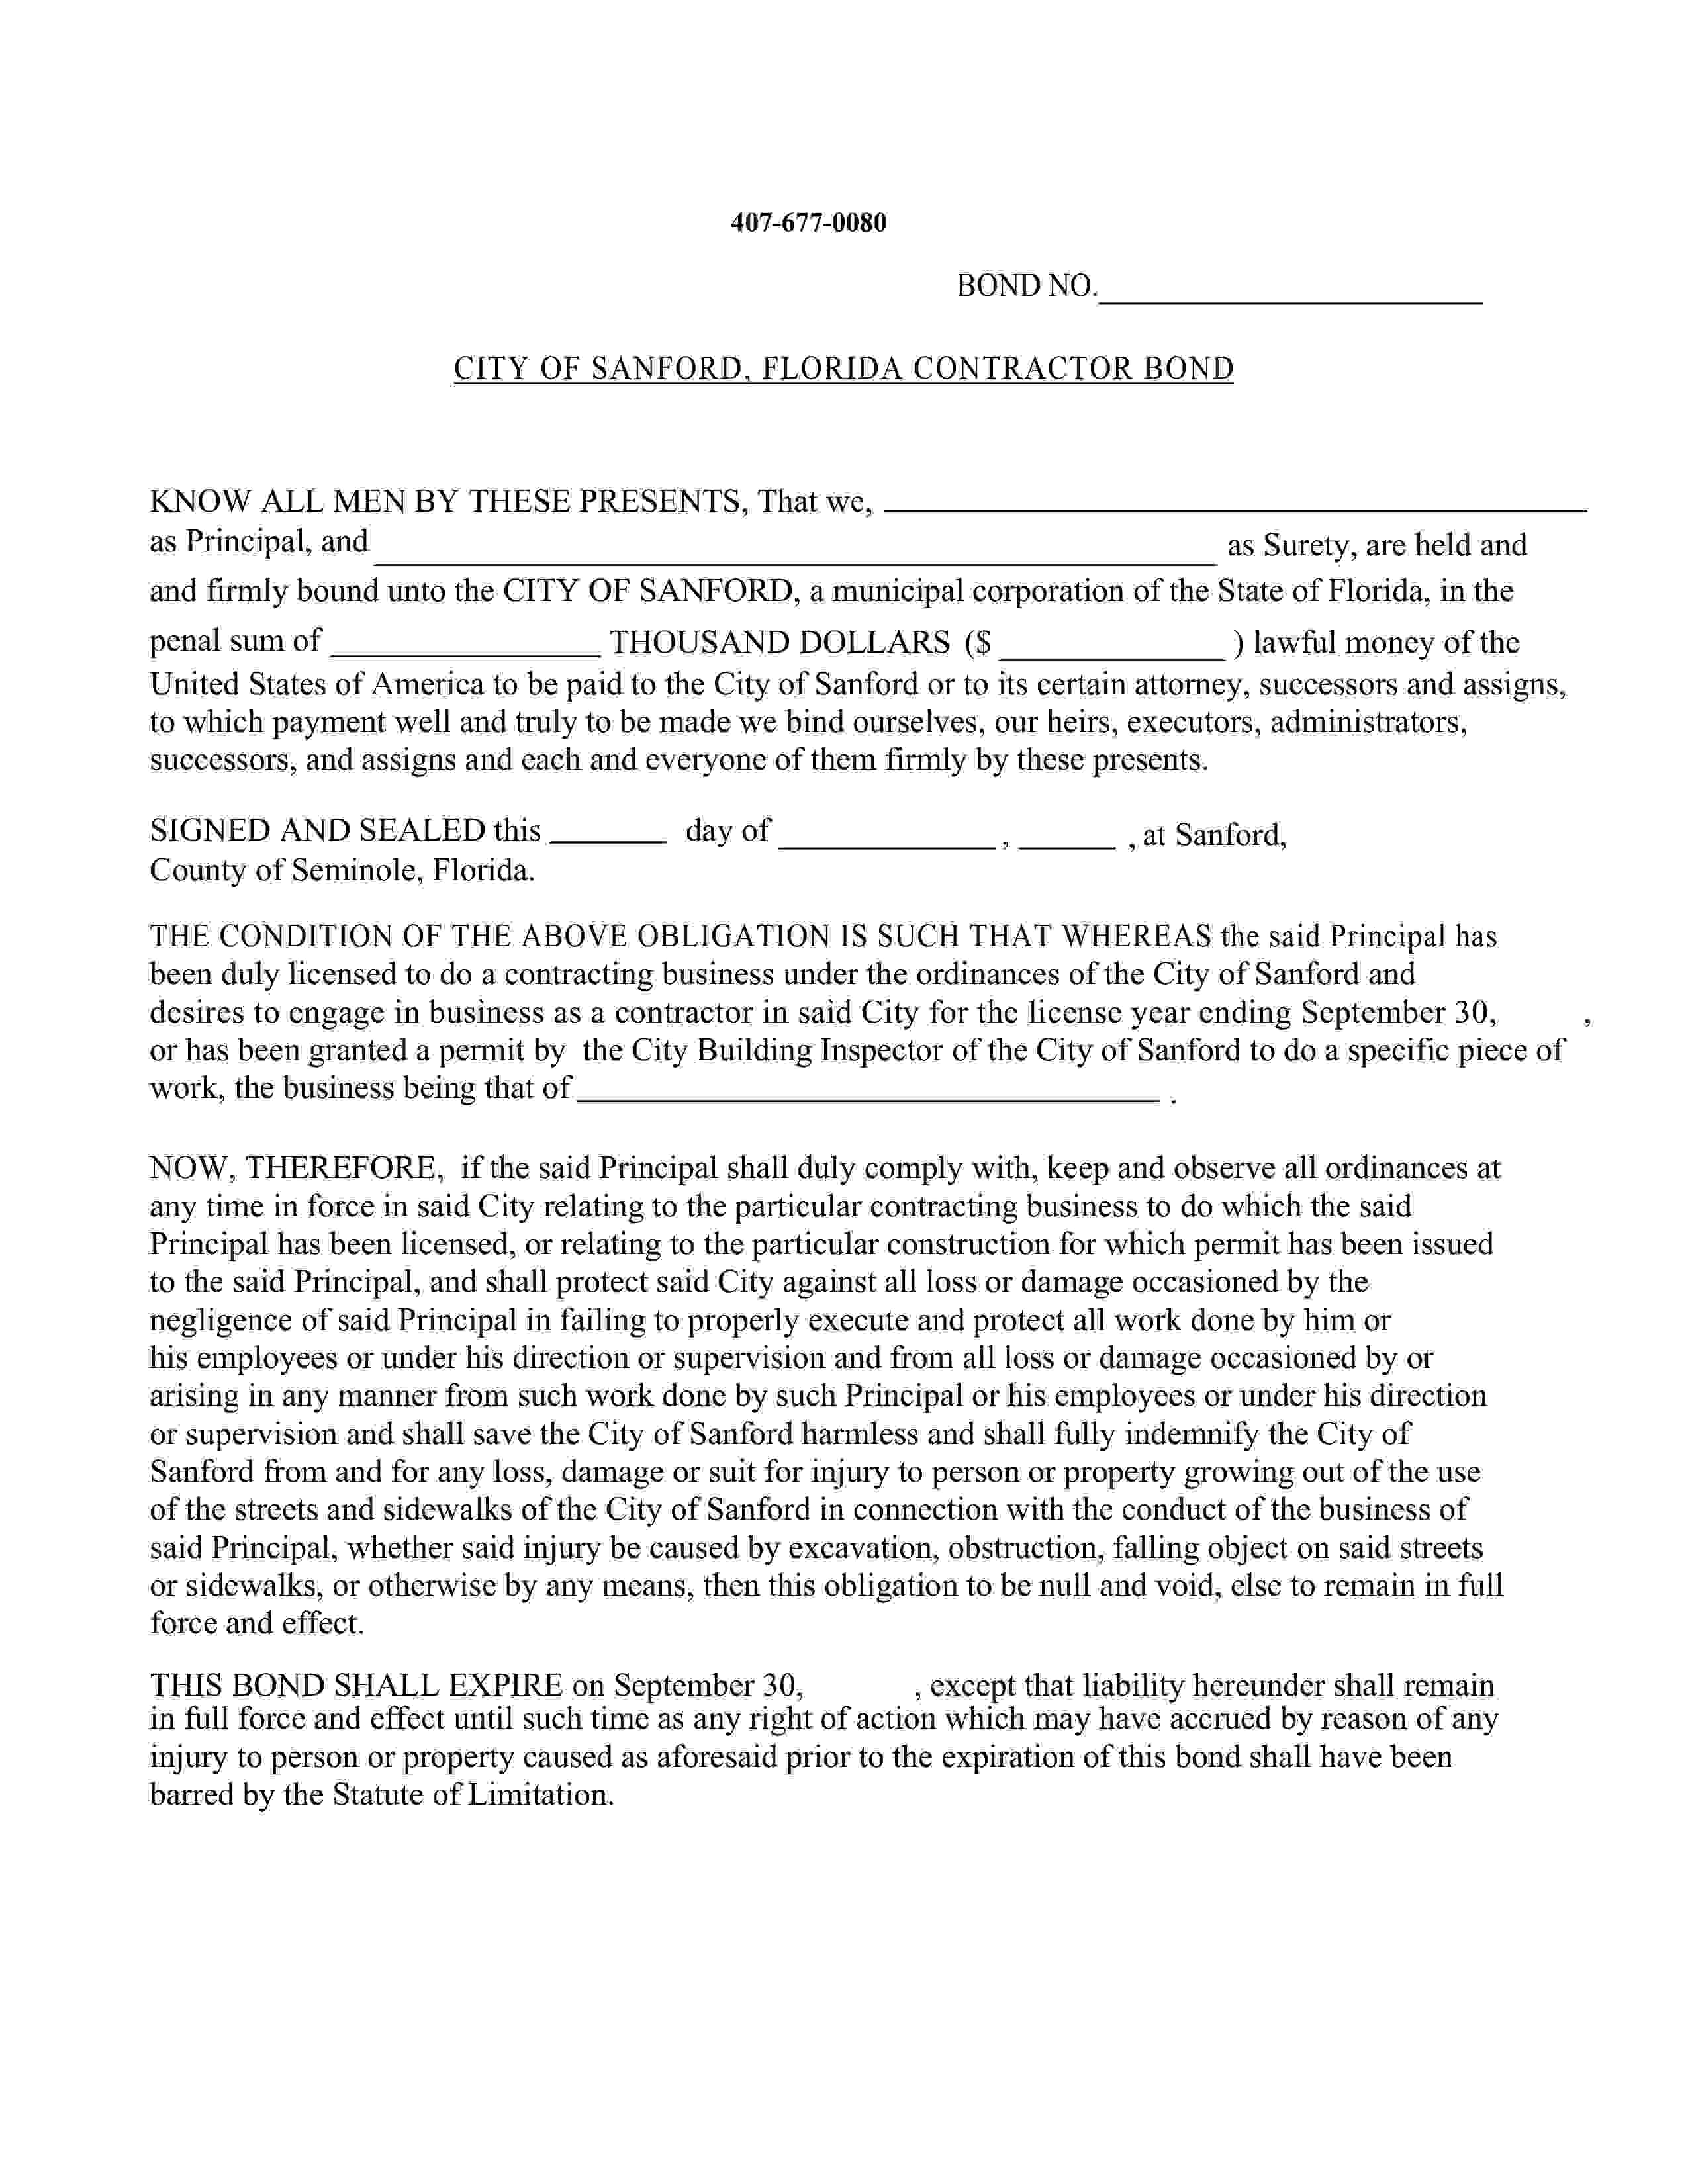 City Of Sanford Sanford - City License/Permit / Sanford - City License/Permit sample image